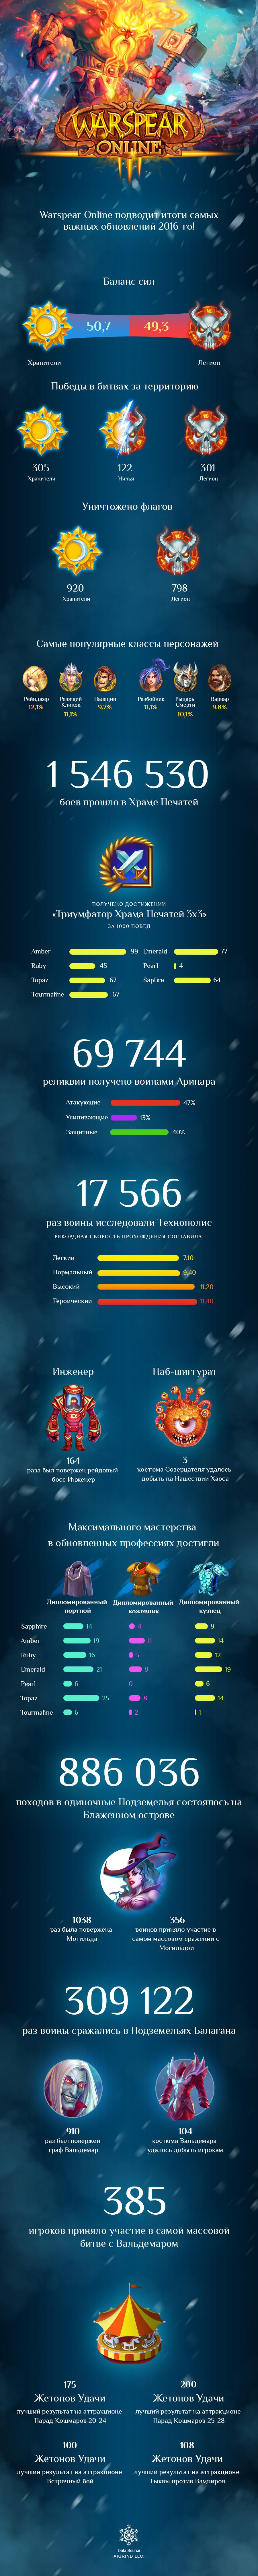 new_year_2017_ru.jpg